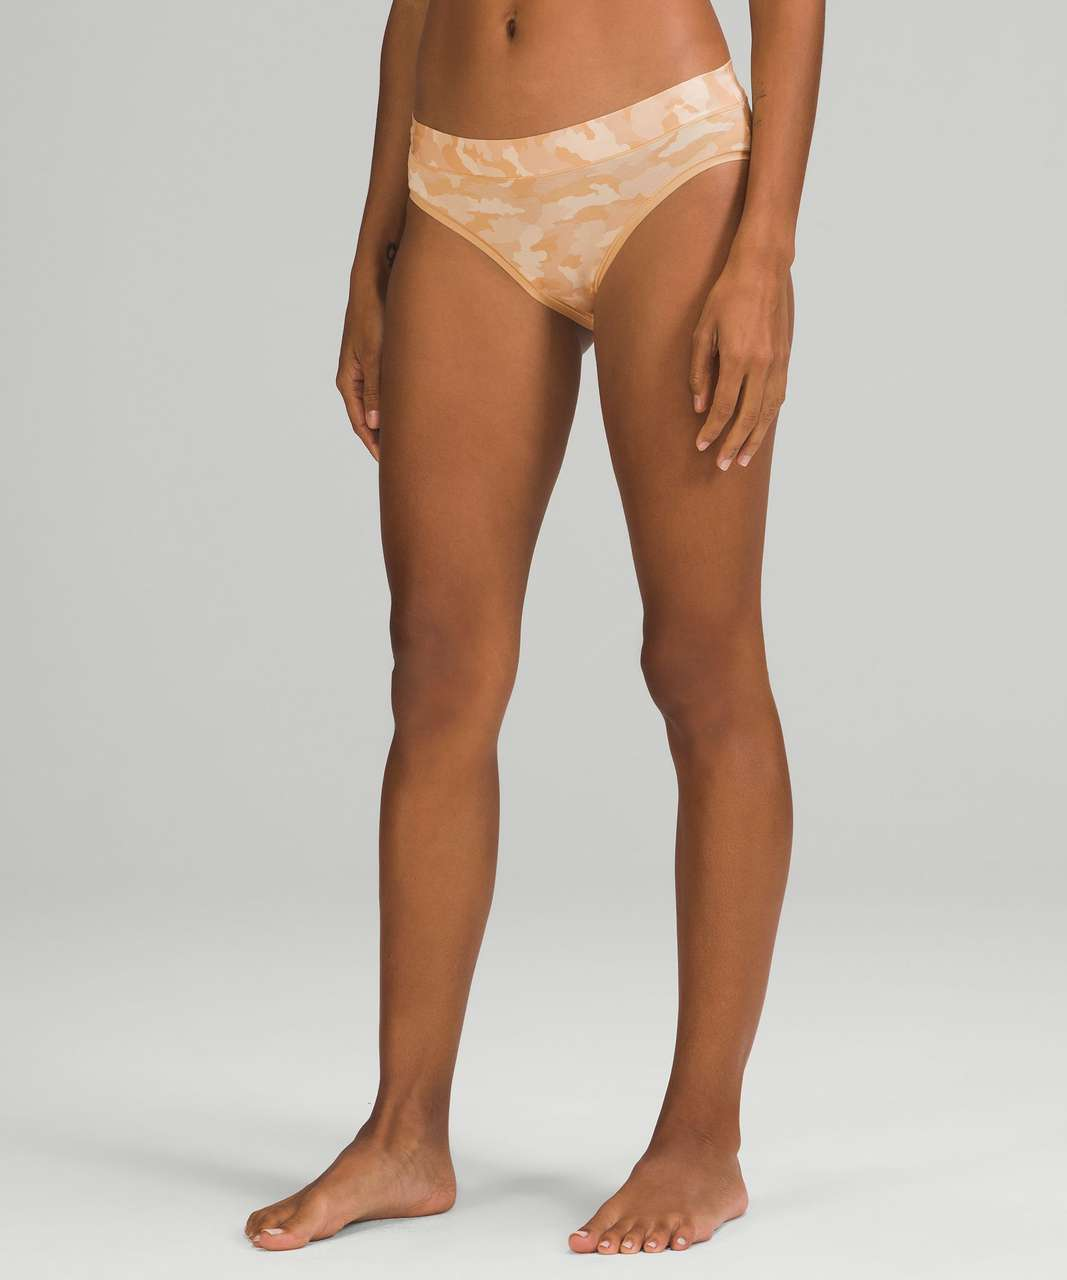 Lululemon UnderEase Mid Rise Cheeky Bikini Underwear 3 Pack - Heritage 365 Camo Mini Pecan Tan Multi / Pink Mist / Black